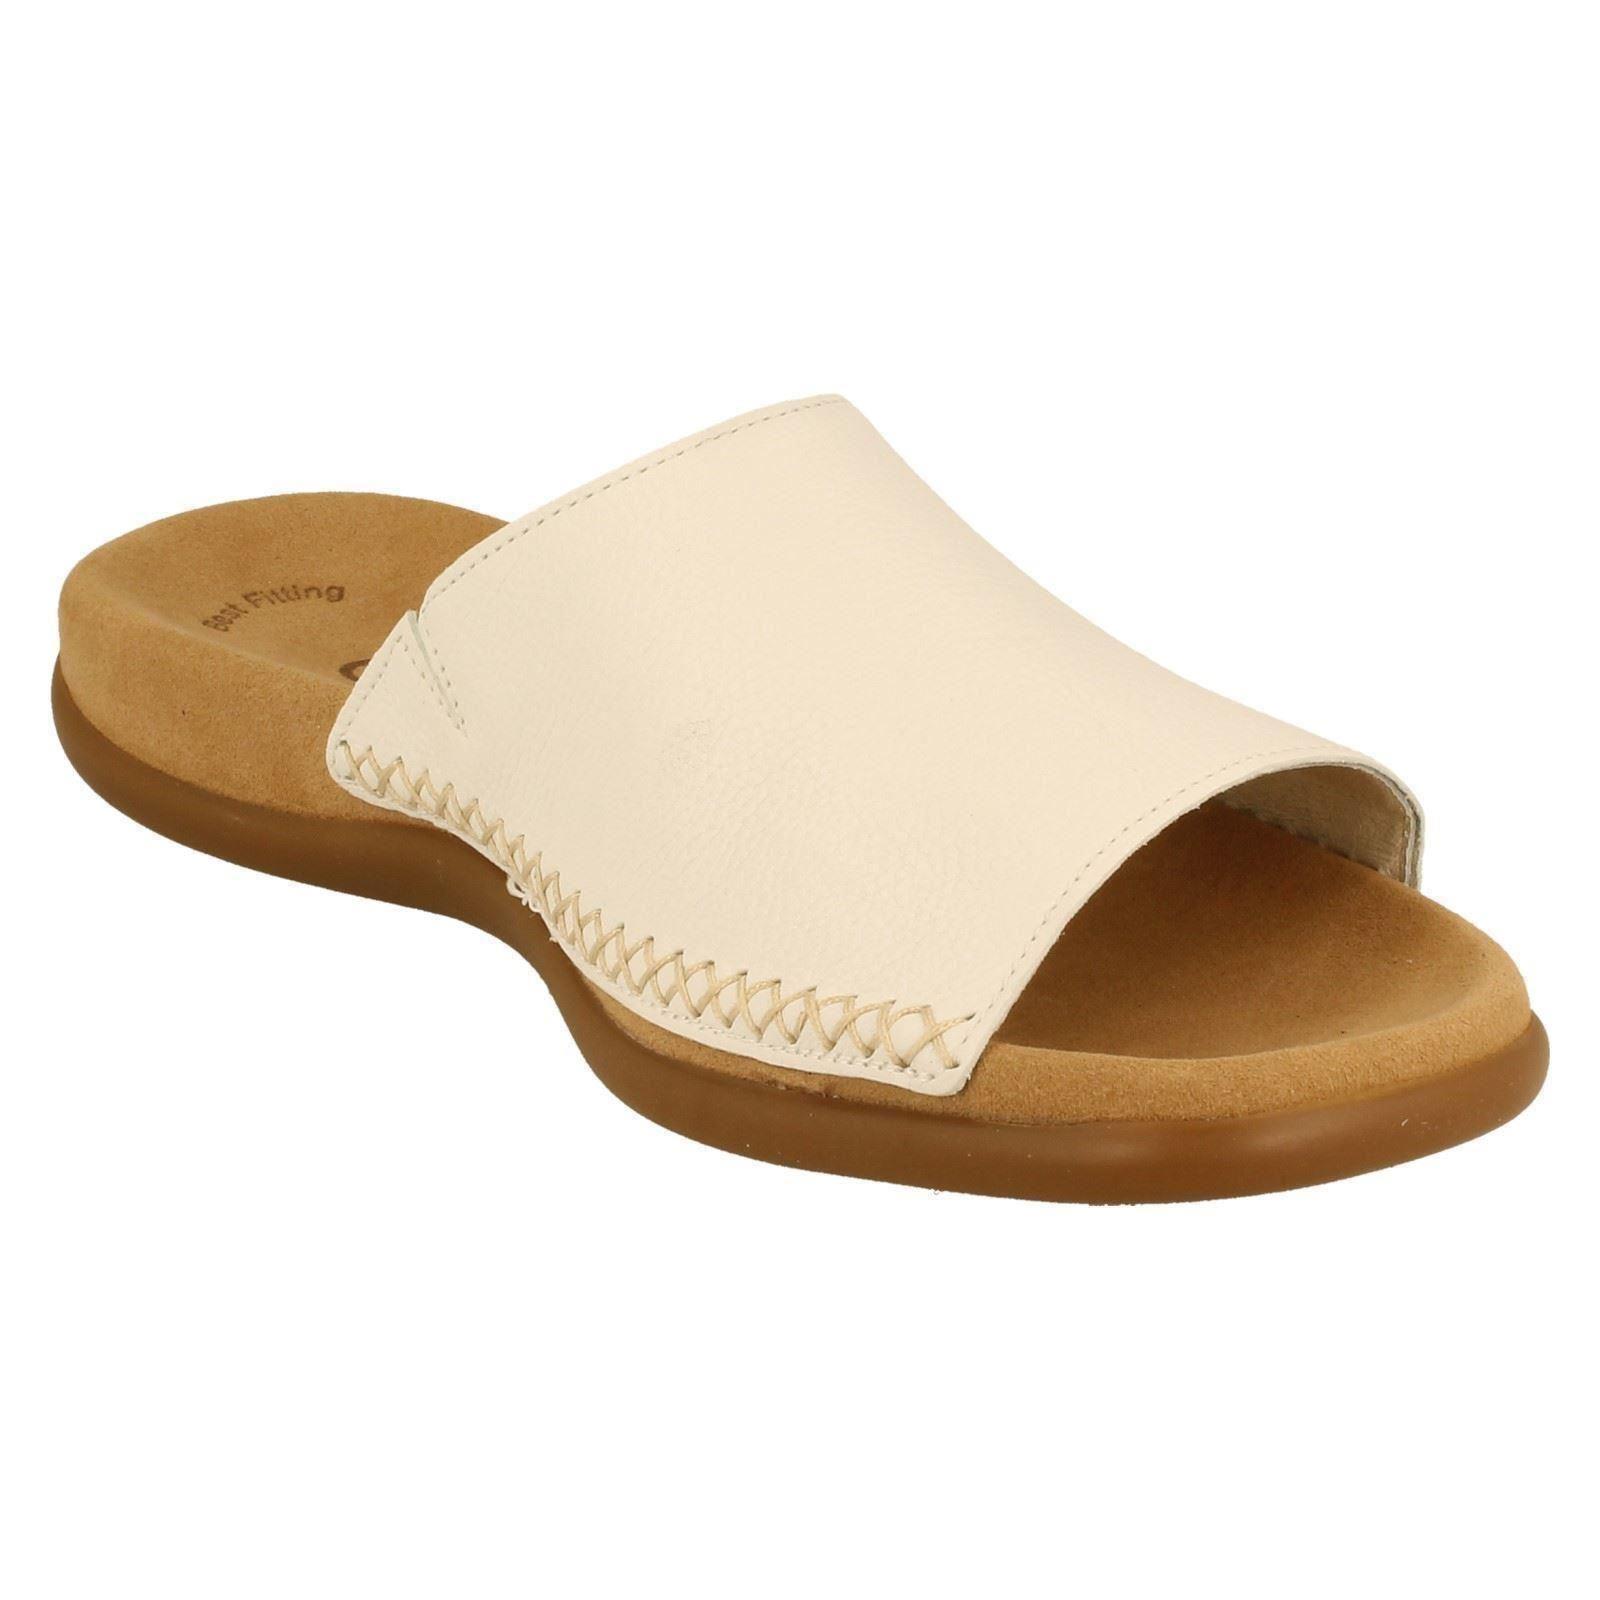 Gabor Ladies Shoes Ebay